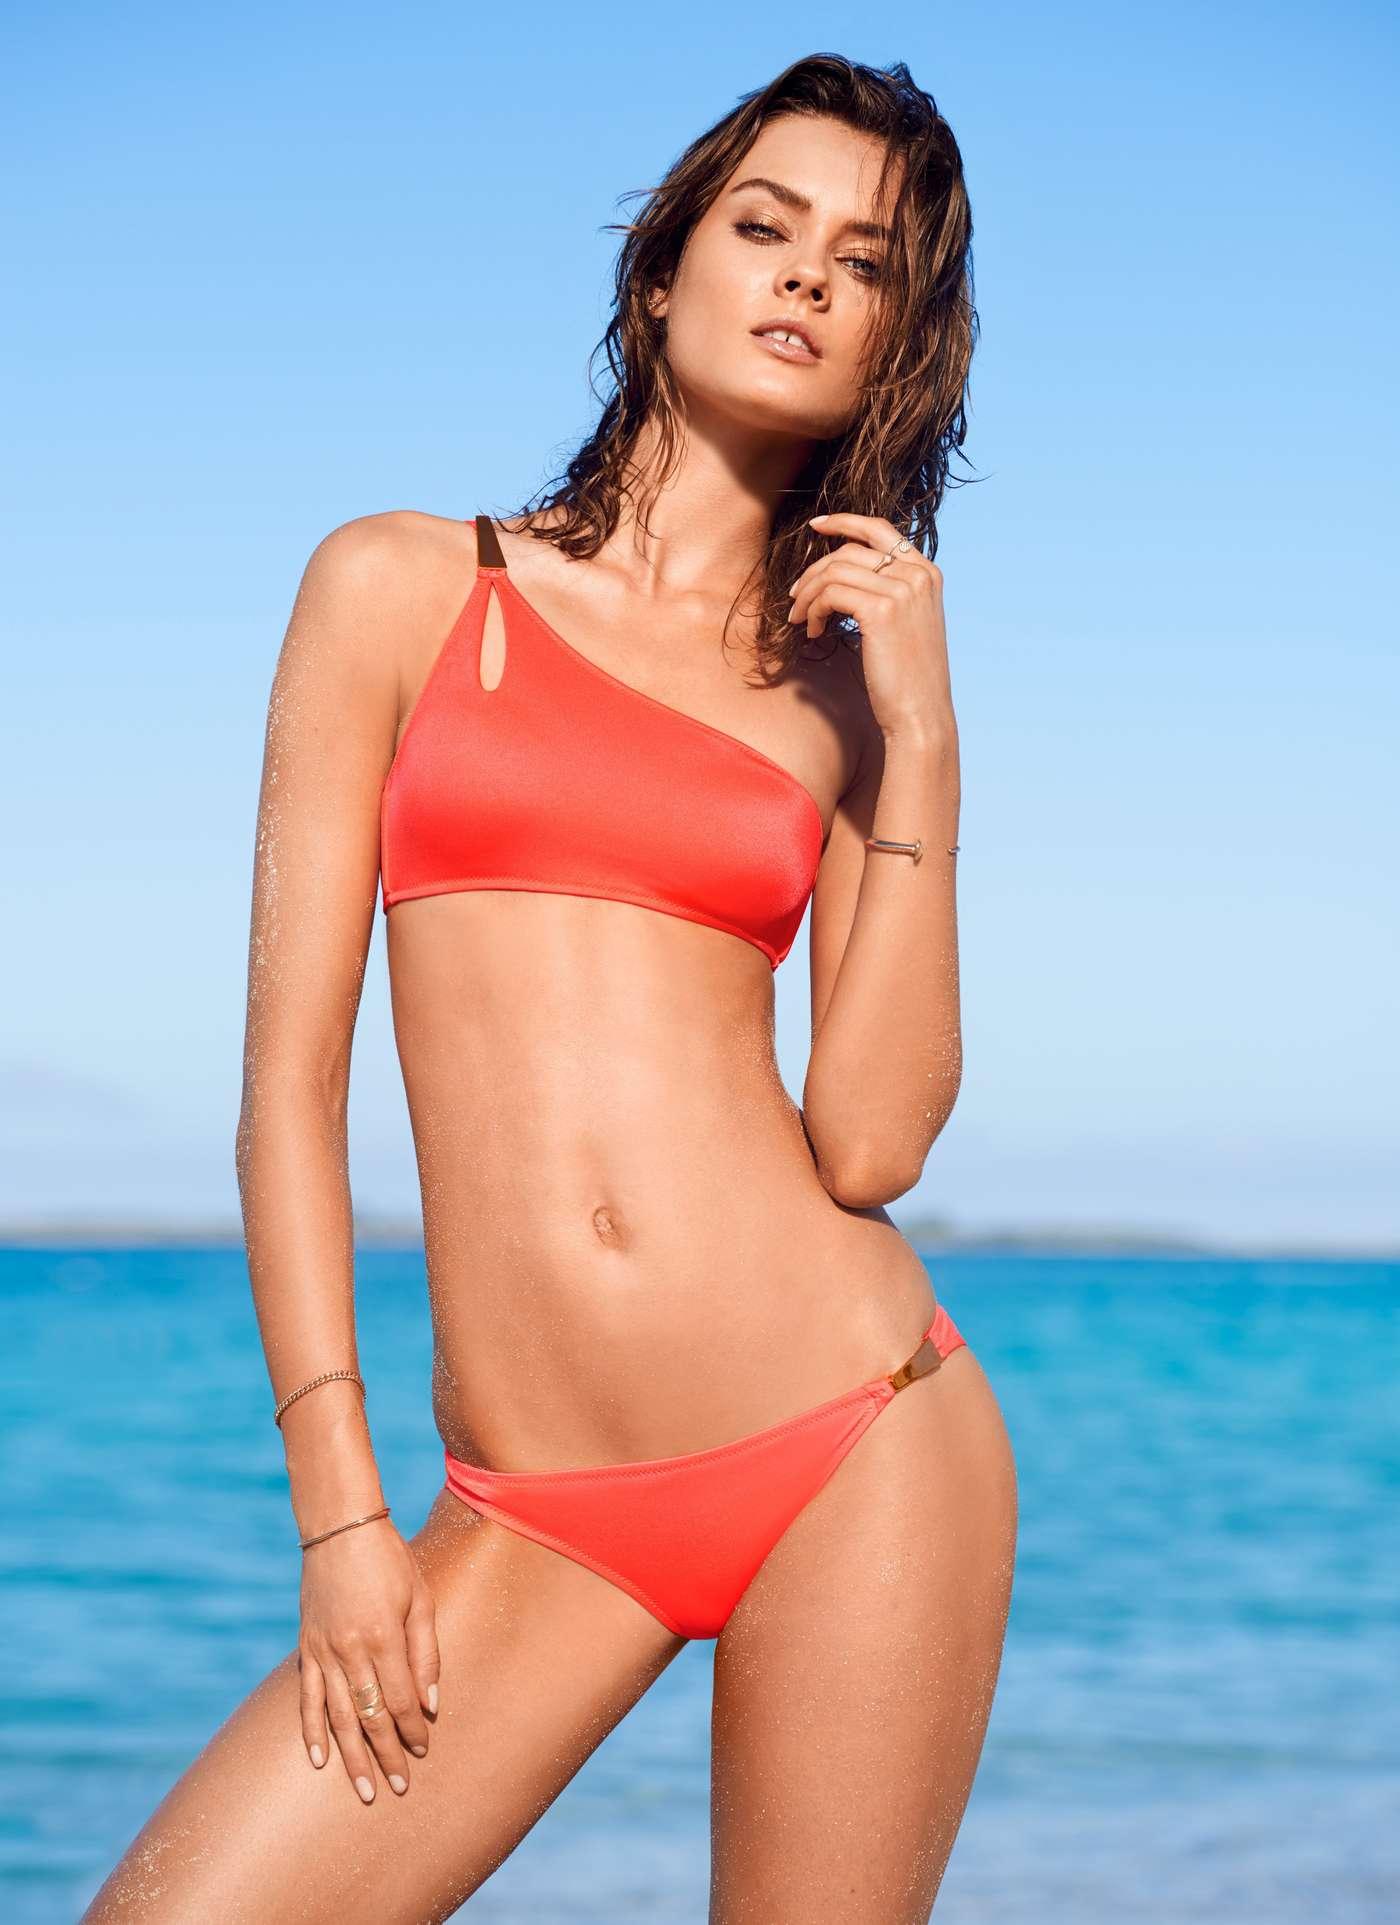 Bikini Monika Jagaciak nudes (95 photo), Tits, Hot, Twitter, braless 2015